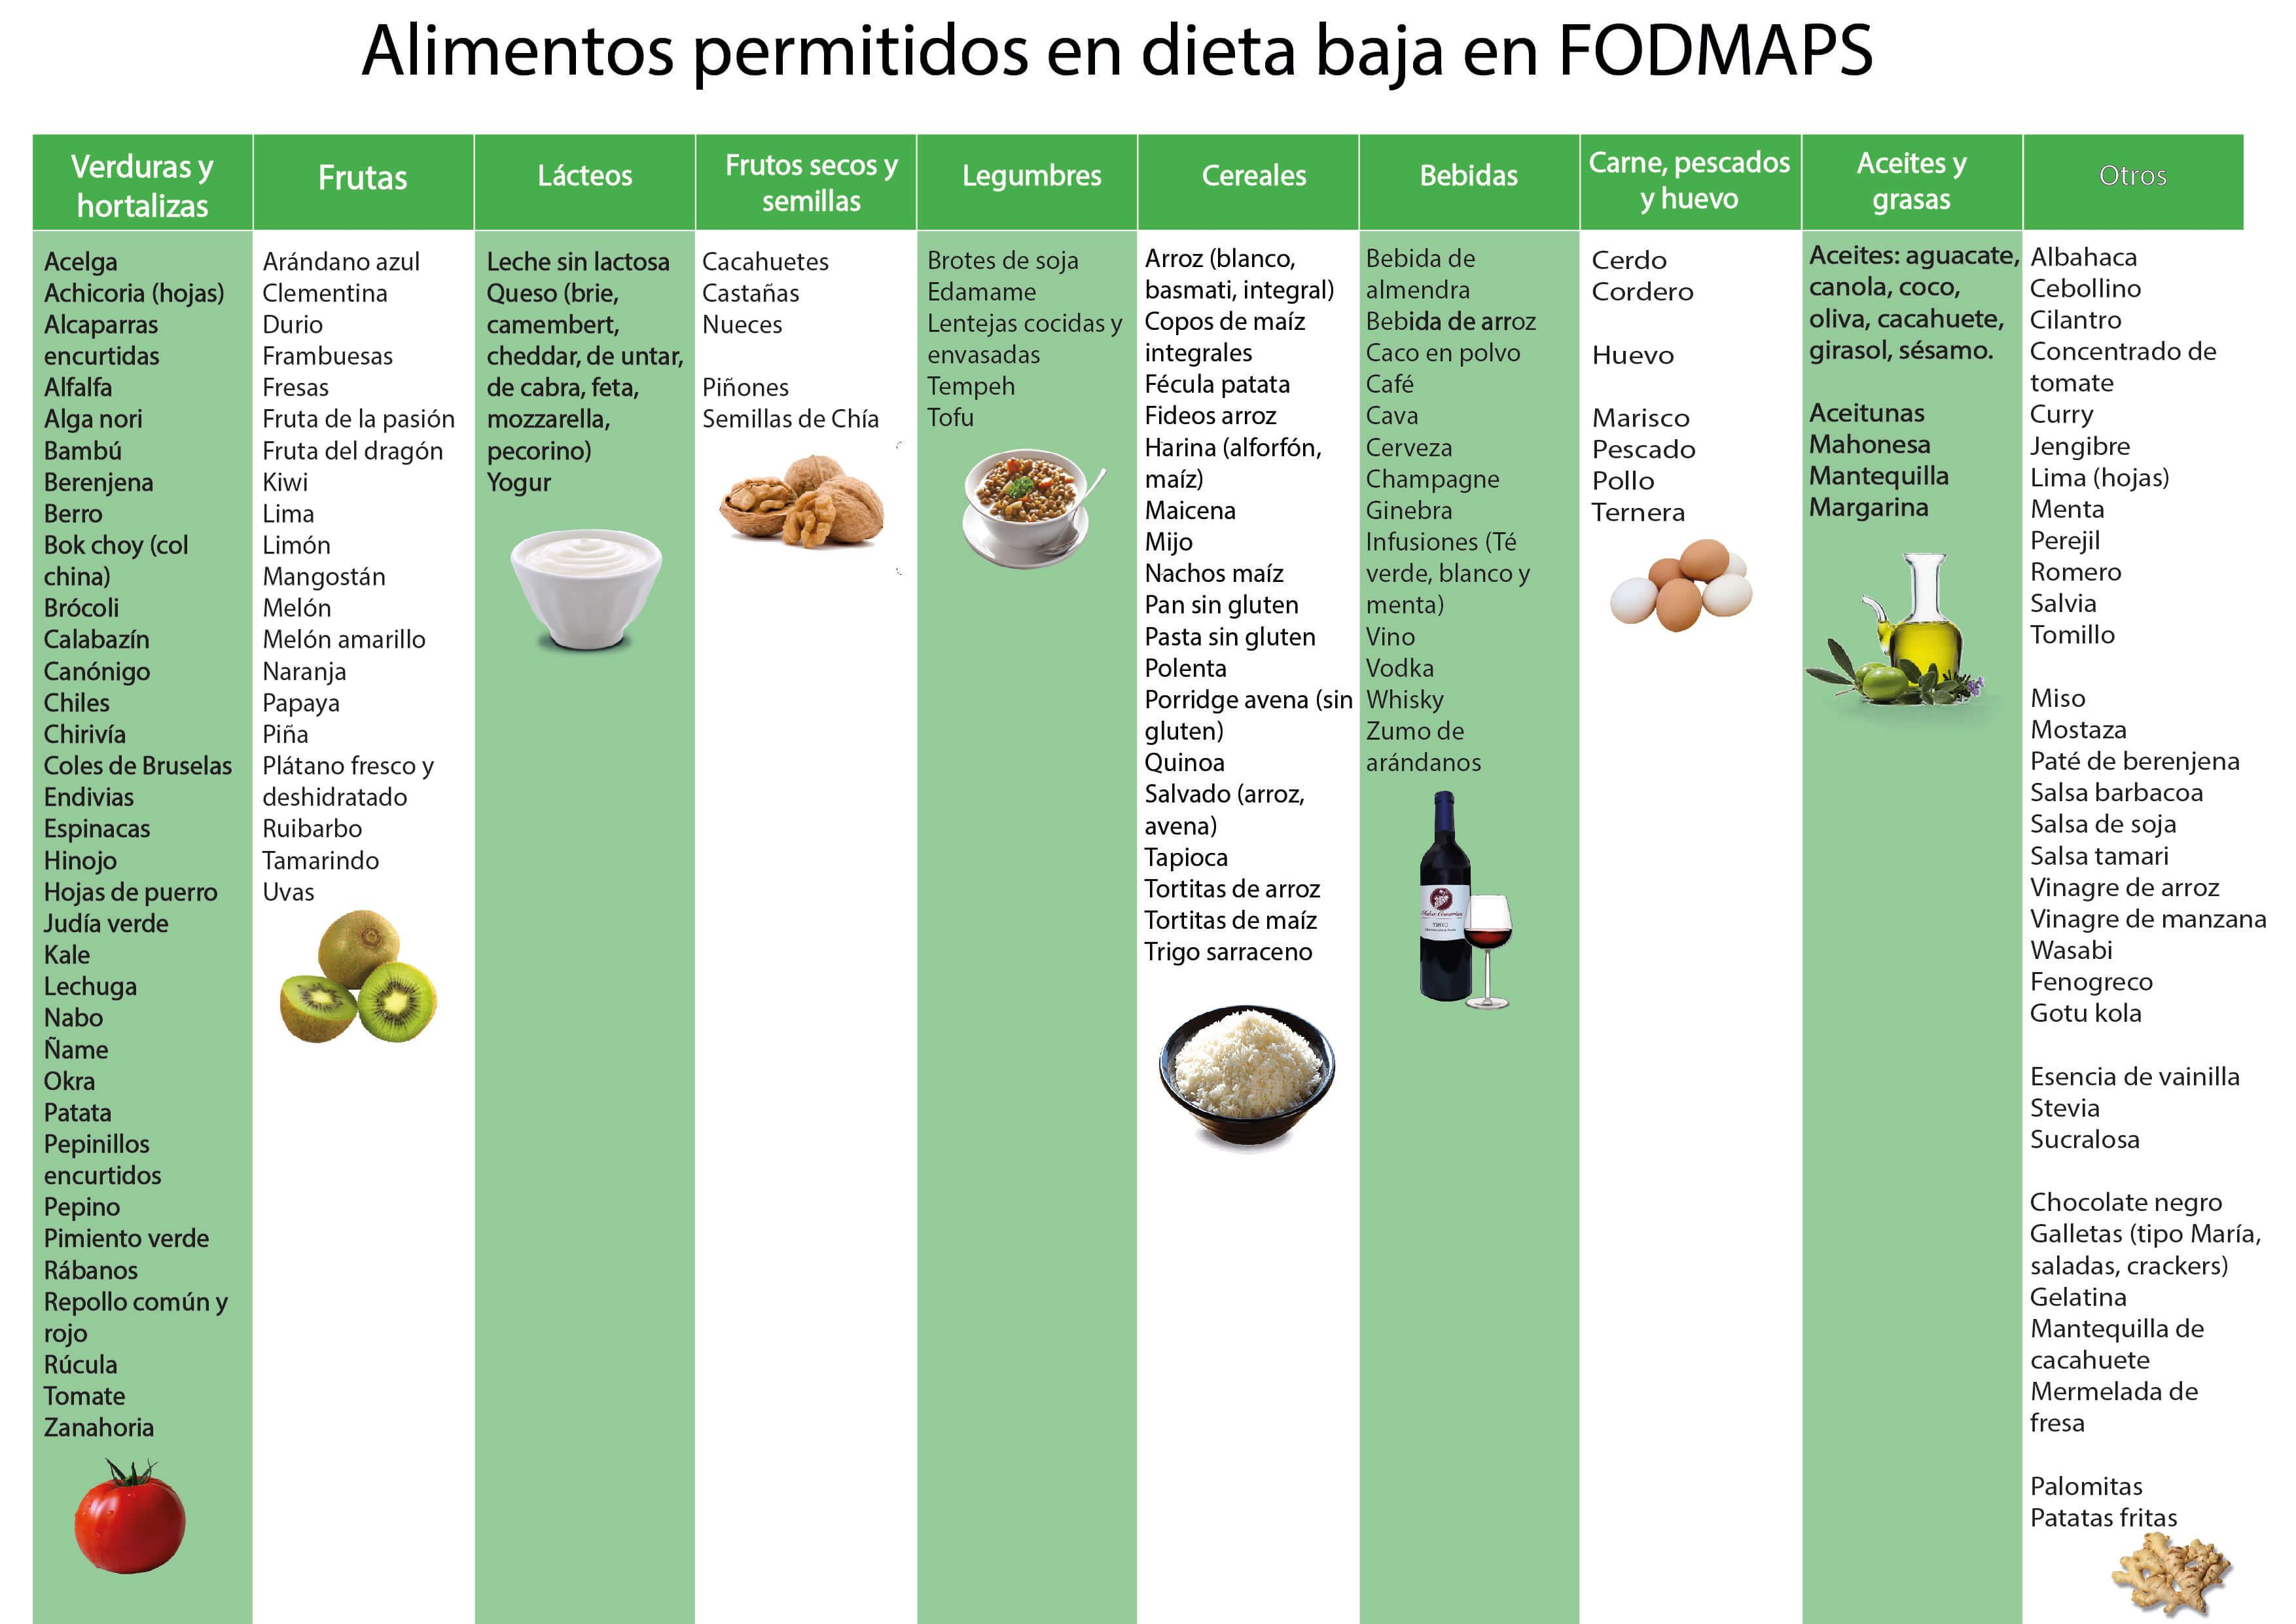 Dieta Fodmap Sin Azucares Fermentables Menus Dieta Fodmap